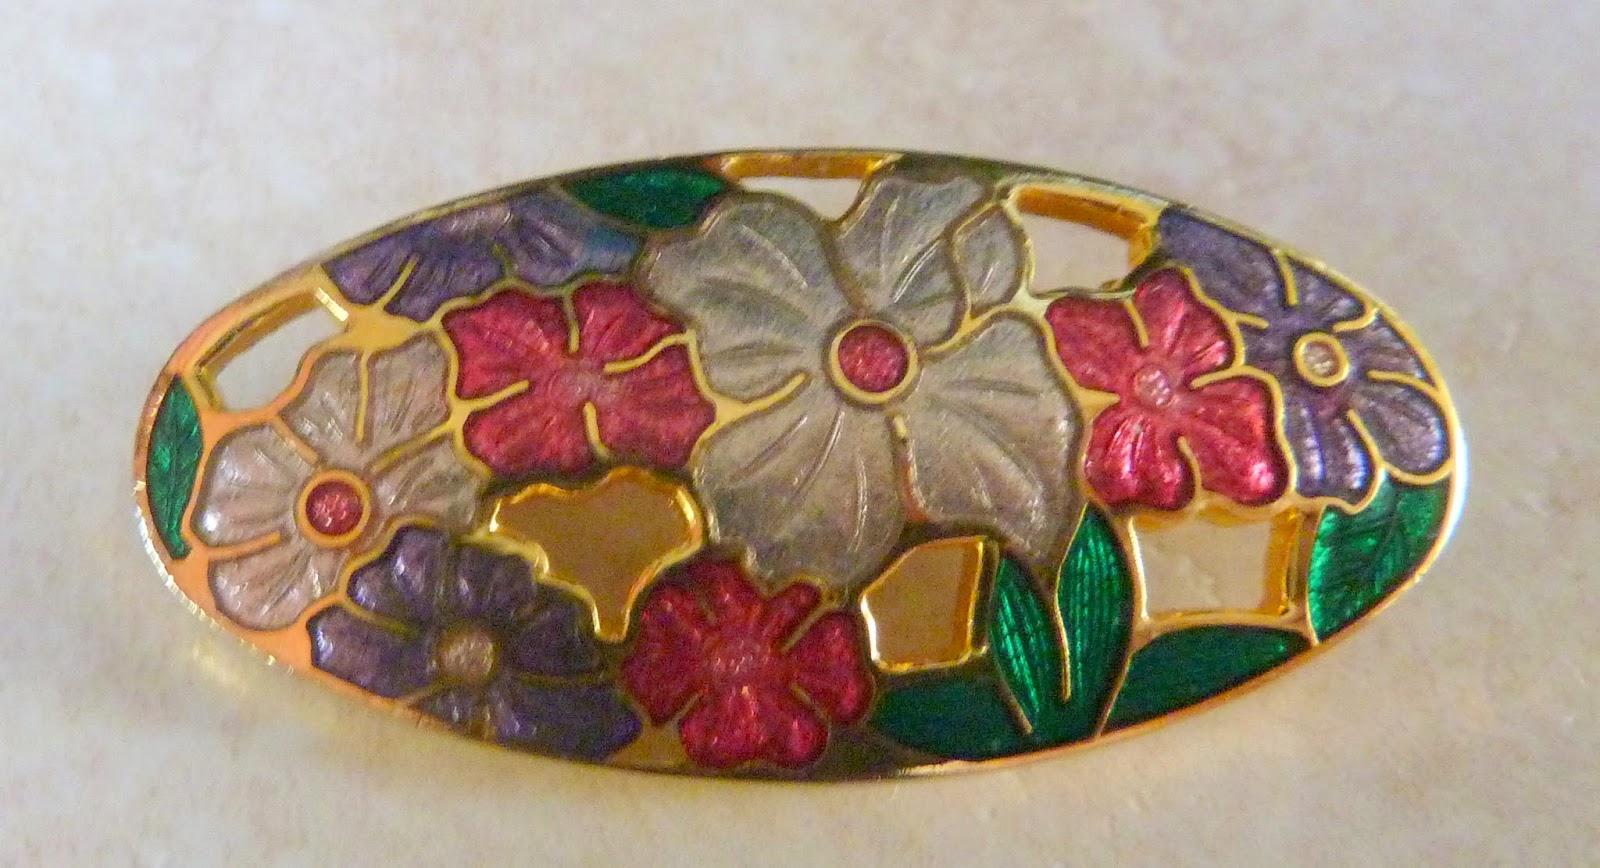 http://www.kcavintagegems.uk/floral-oval-cloisonne-enamel-brooch-416-p.asp